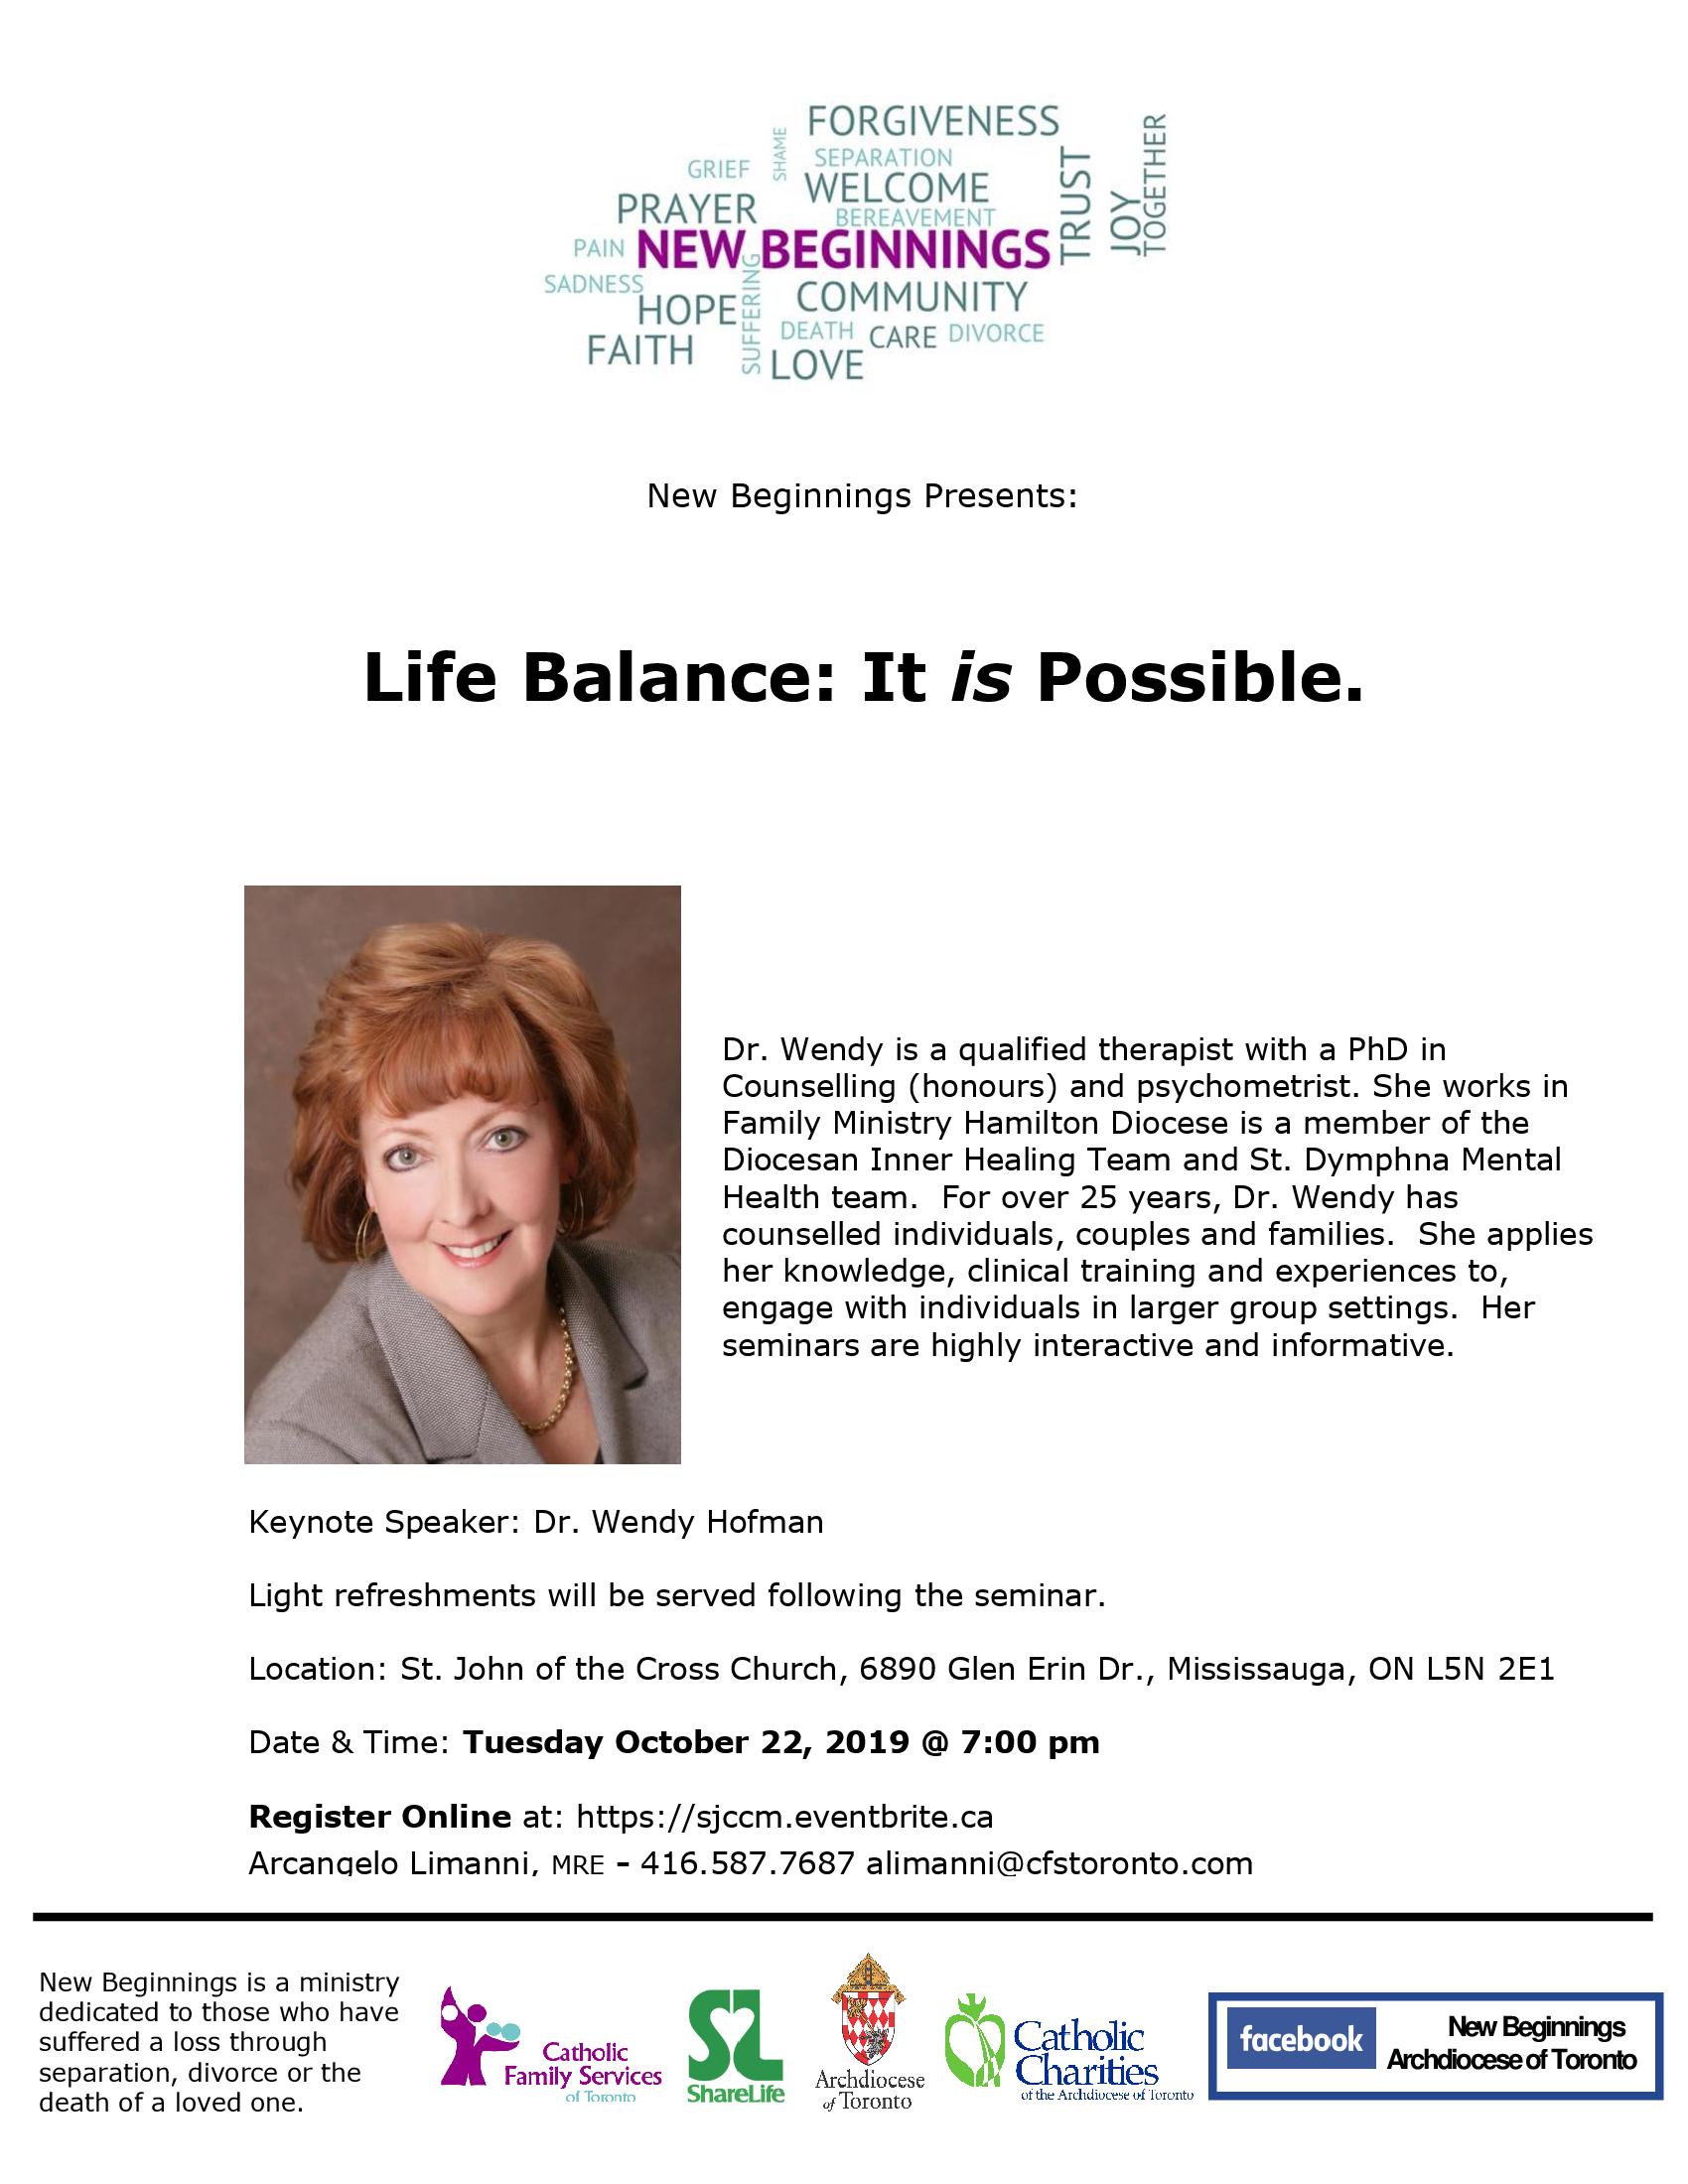 lifebalanceitispossible.seminar40st.johnofthecrossparish.jpg